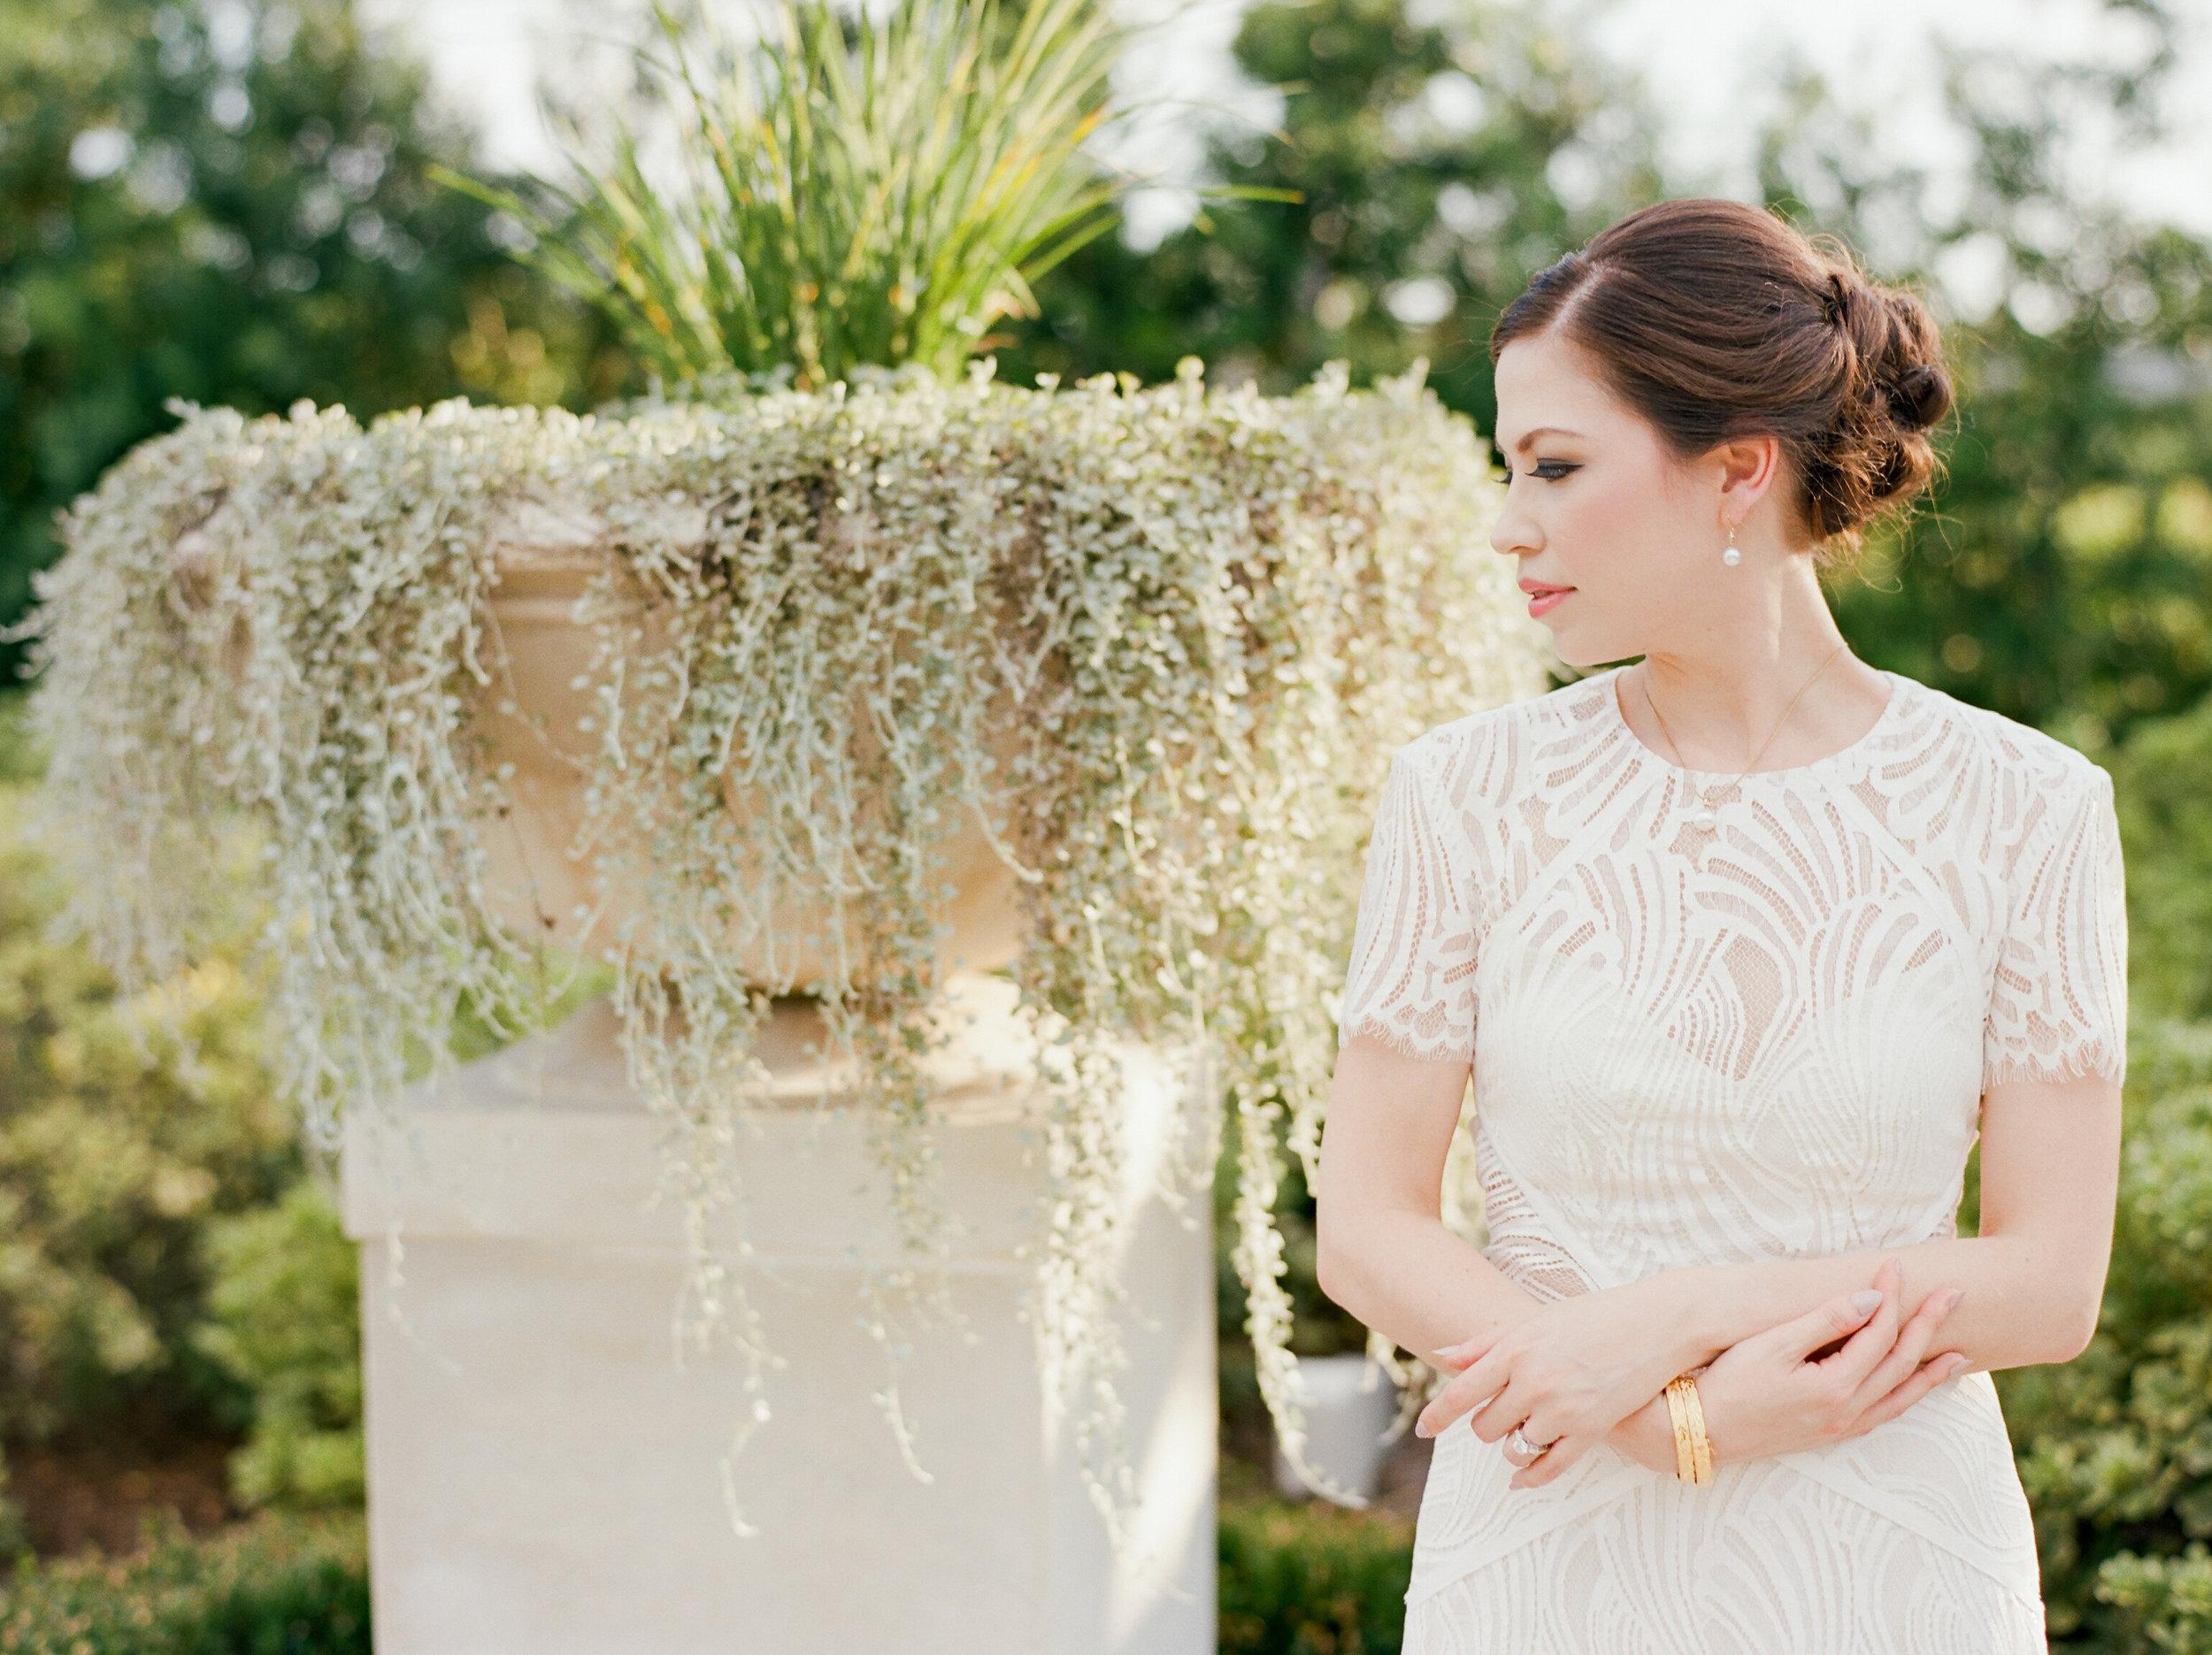 mcgovern-centennial-gardens-wedding-houston-wedding-photographer-bridals-film-austin-wedding-photographer-11.jpg